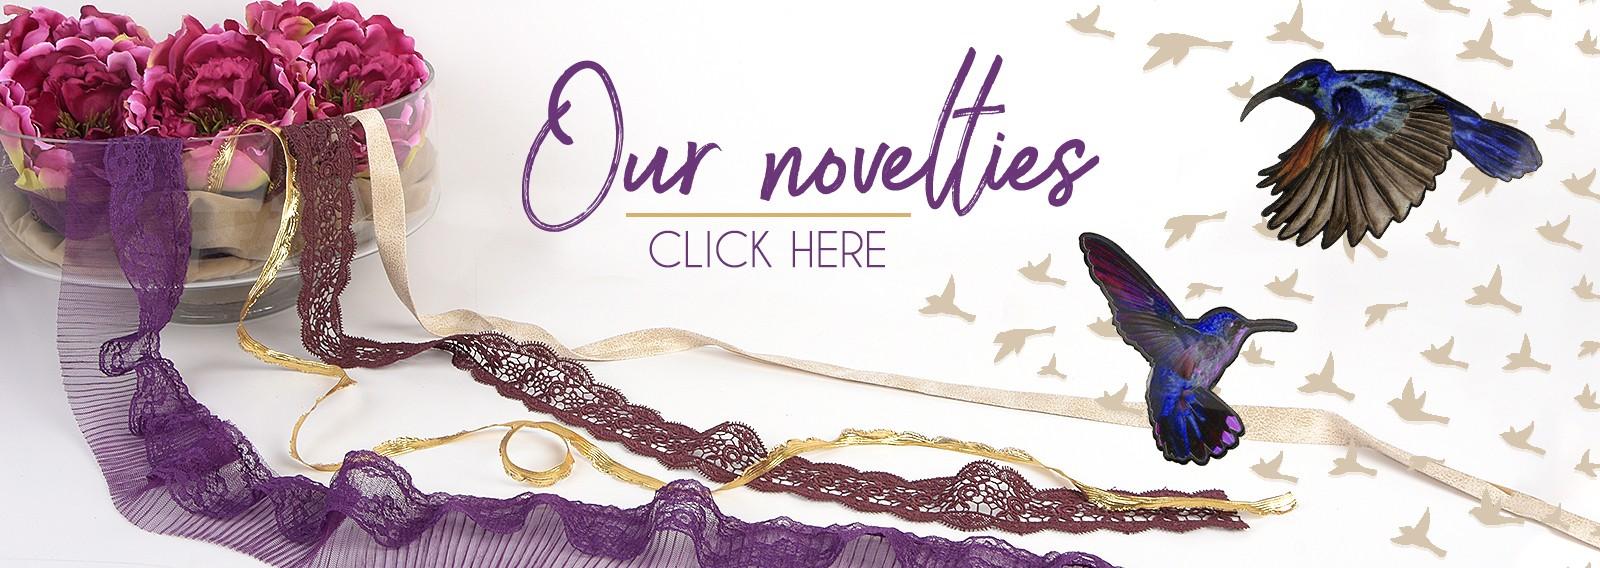 Our novelties